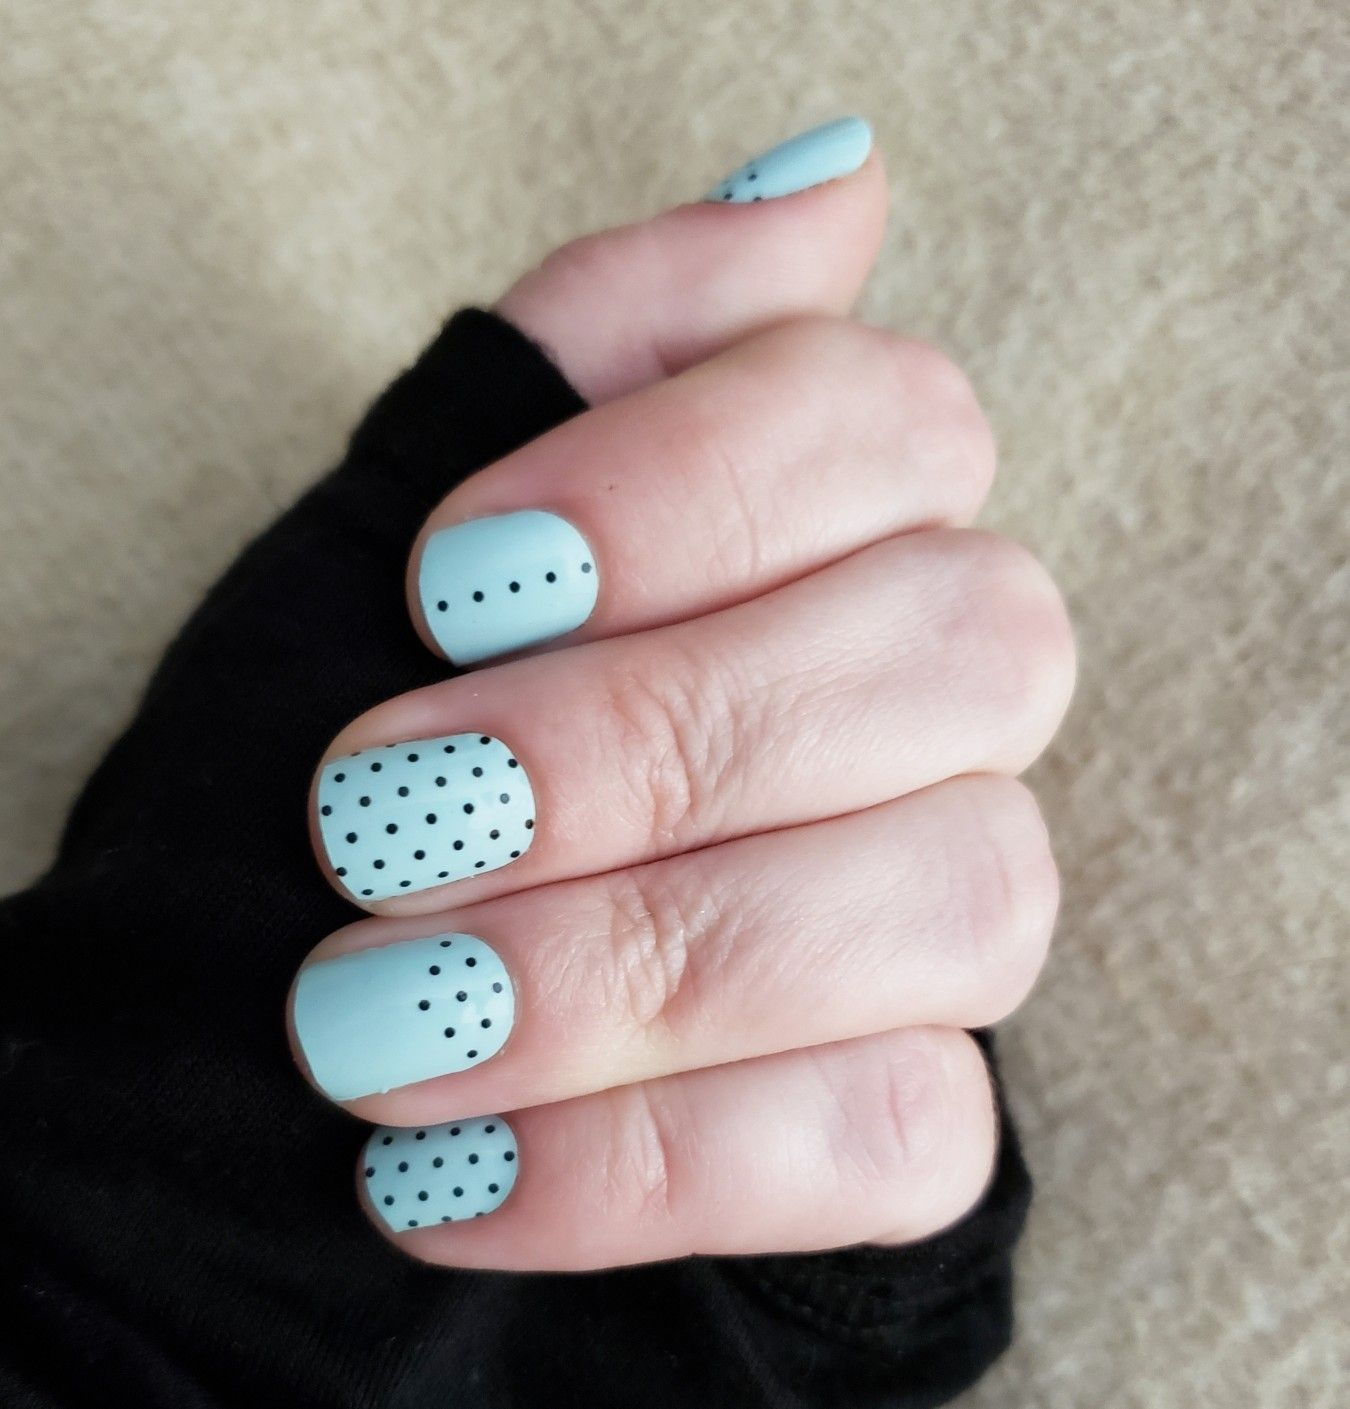 Mint Nails with Polka Dots - Color Street Nails - I've Dot ...